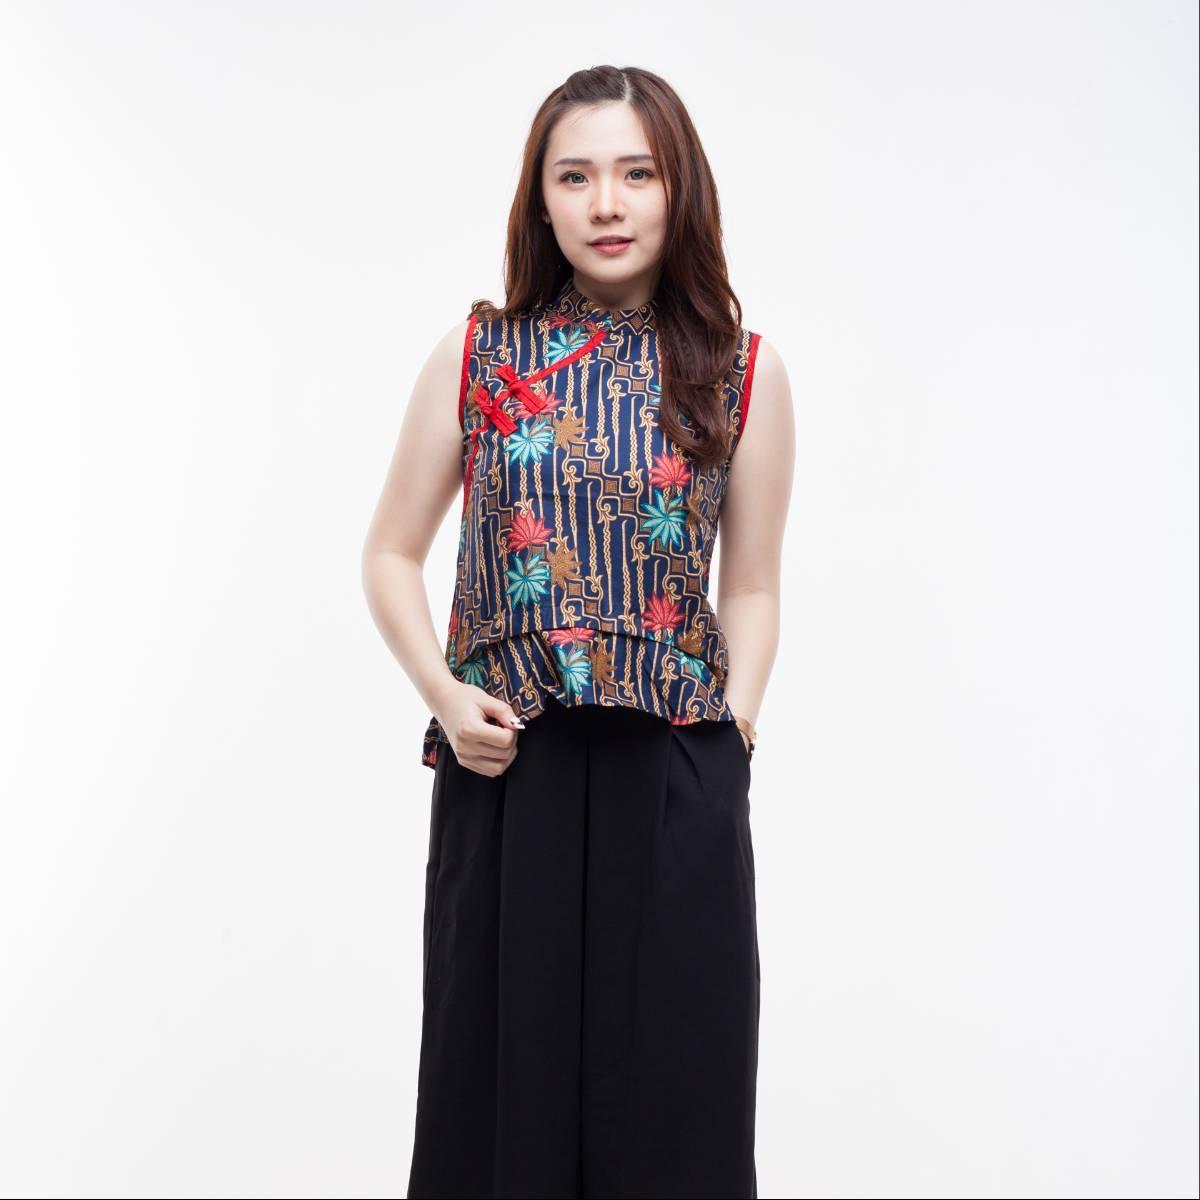 Atasan Batik Wanita Modern - Amel Top2